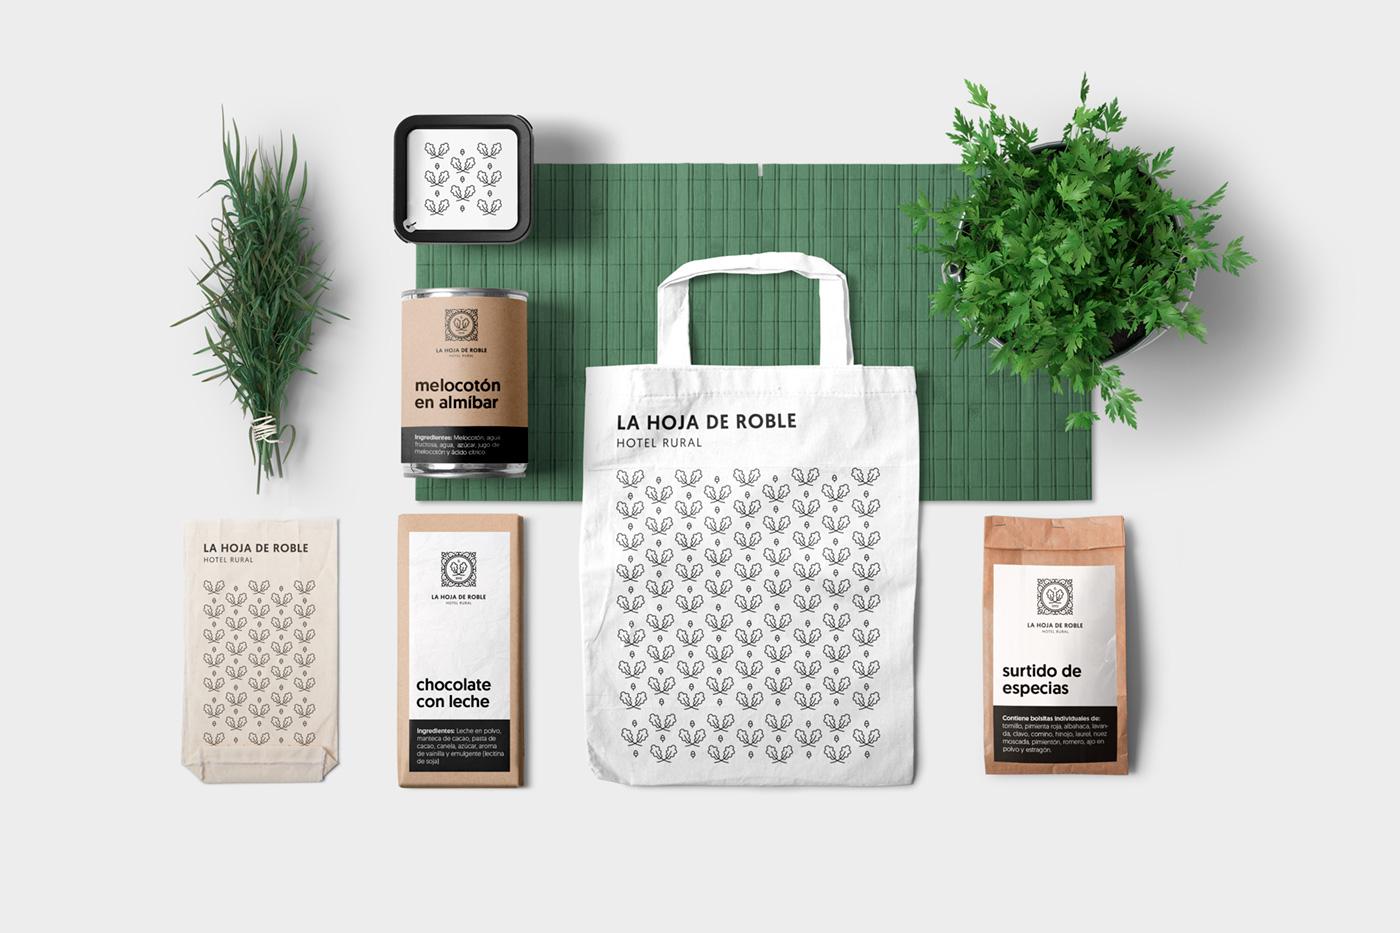 pixelarte-estudio-diseno-grafico-Diseno-packaging-hotel